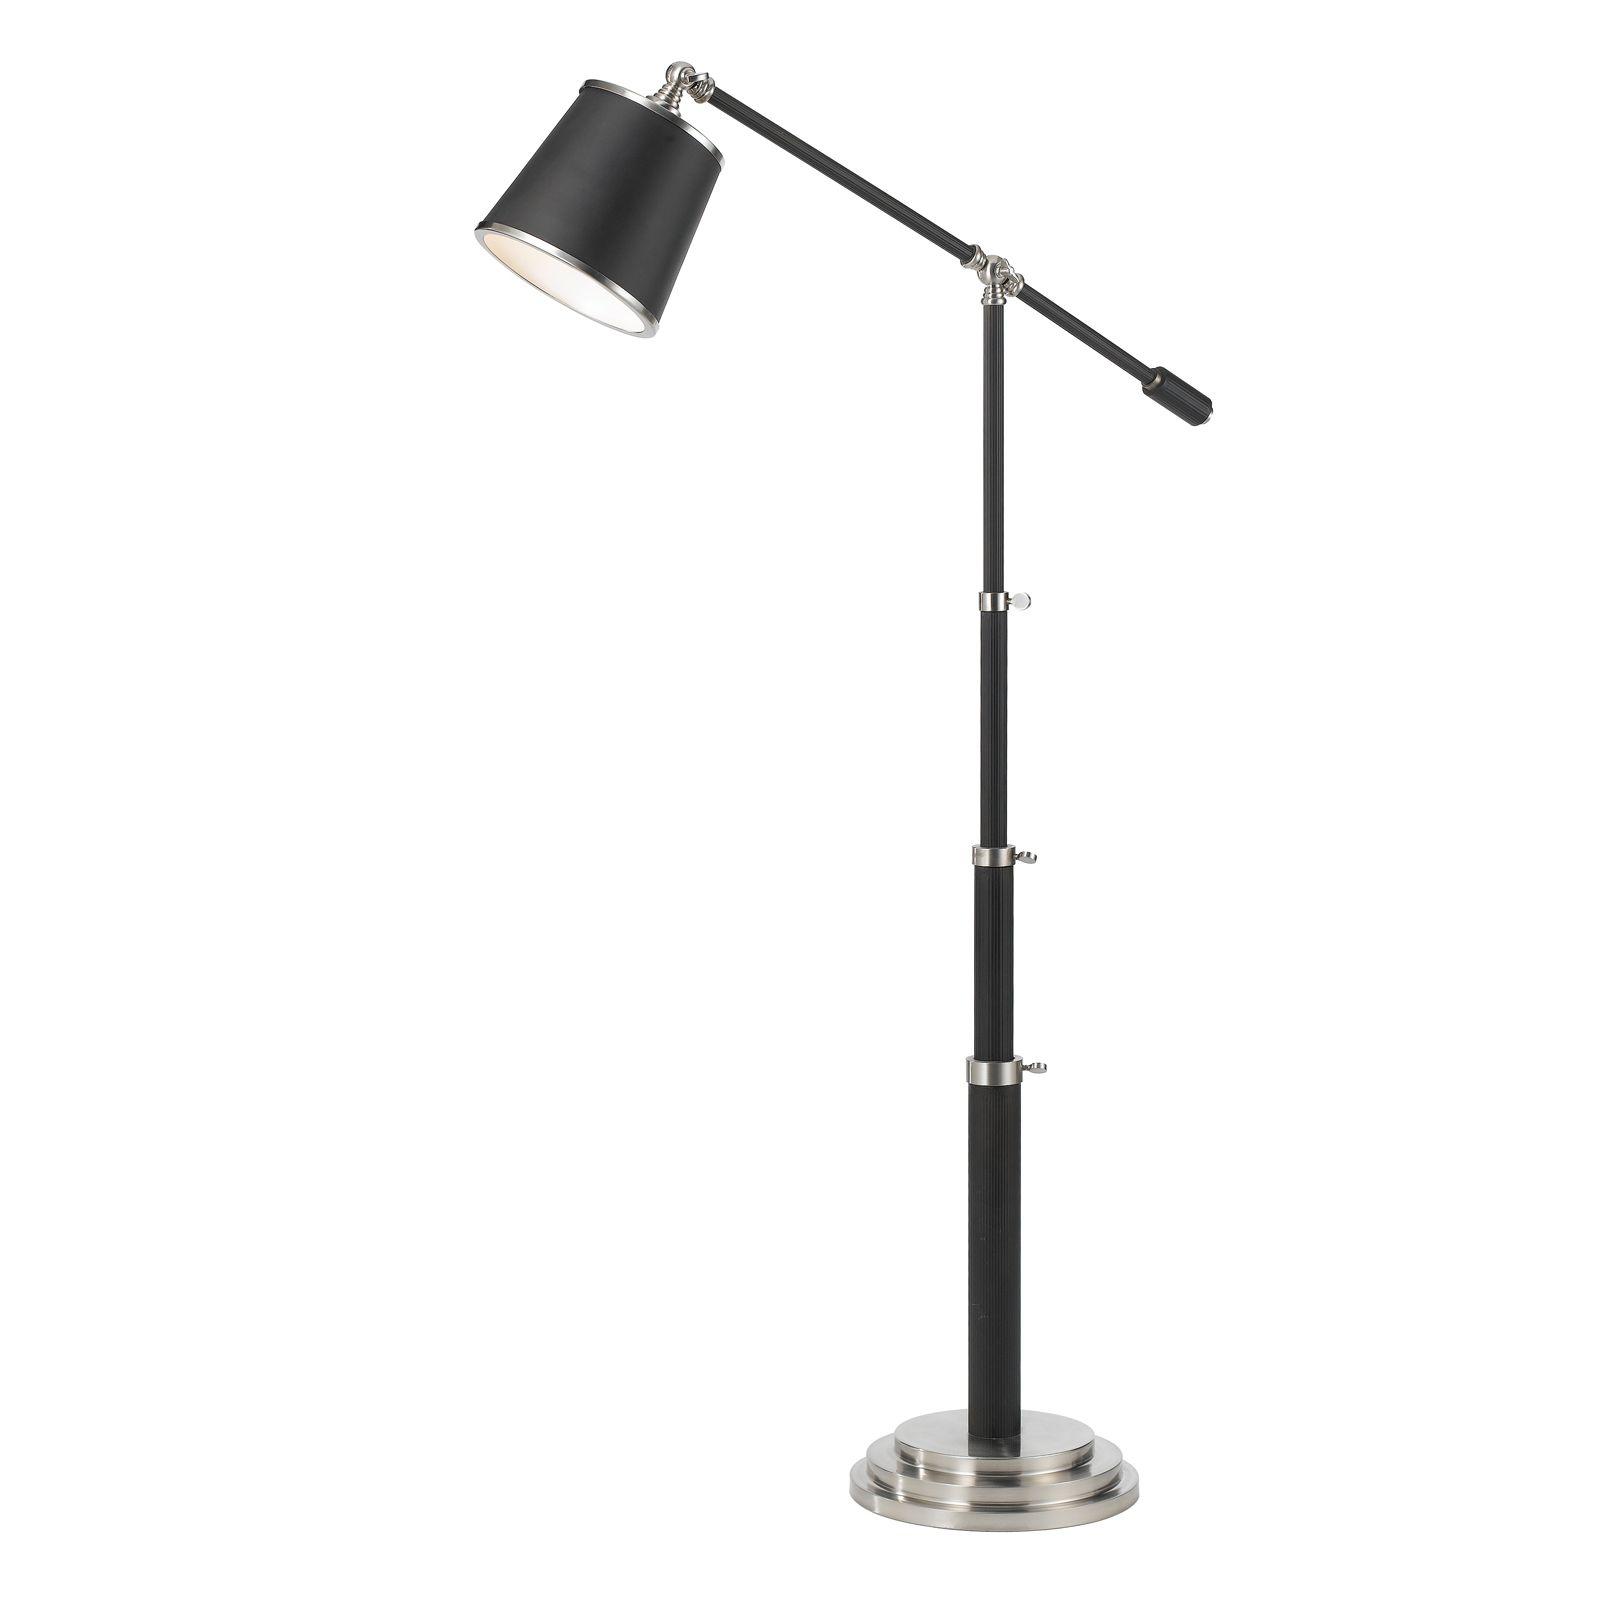 Scope Adjustable Floor Lamp